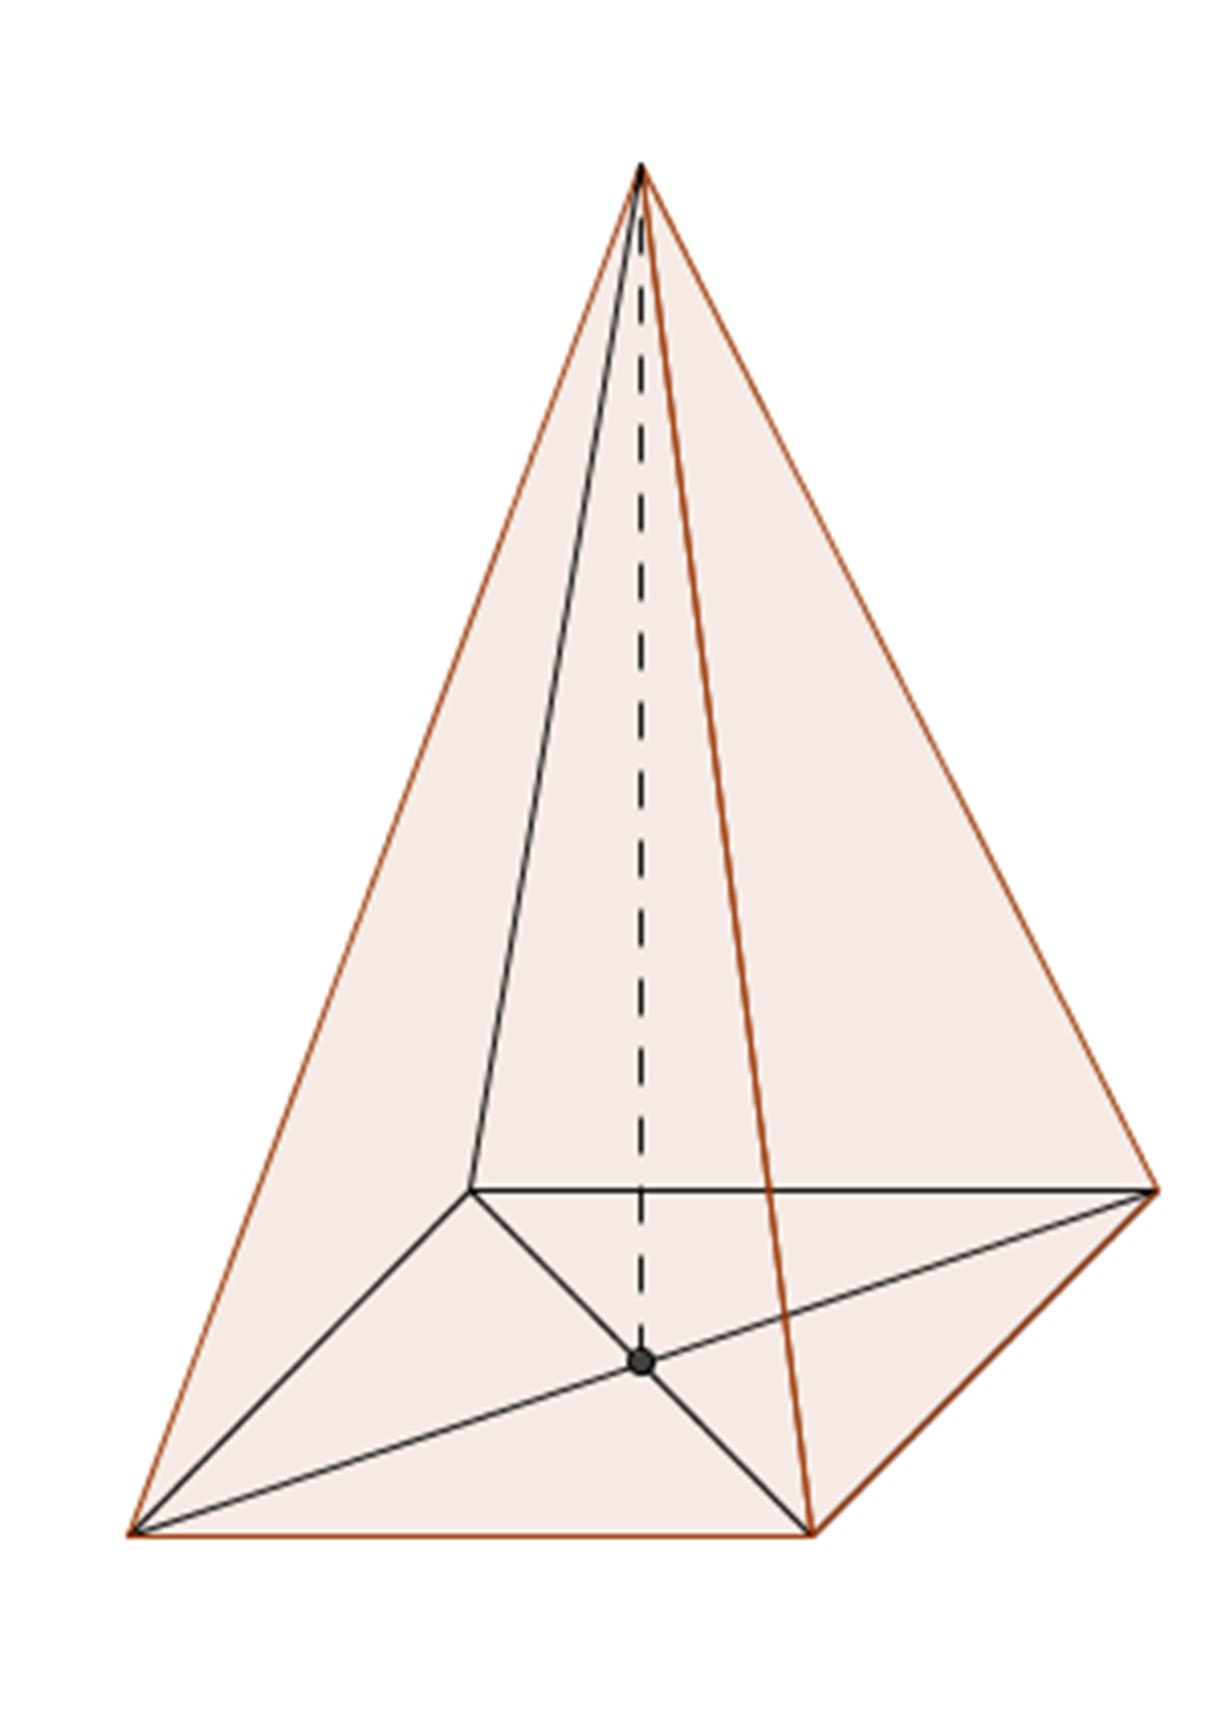 Drawn pyramid rectangular Type figures surface volume and